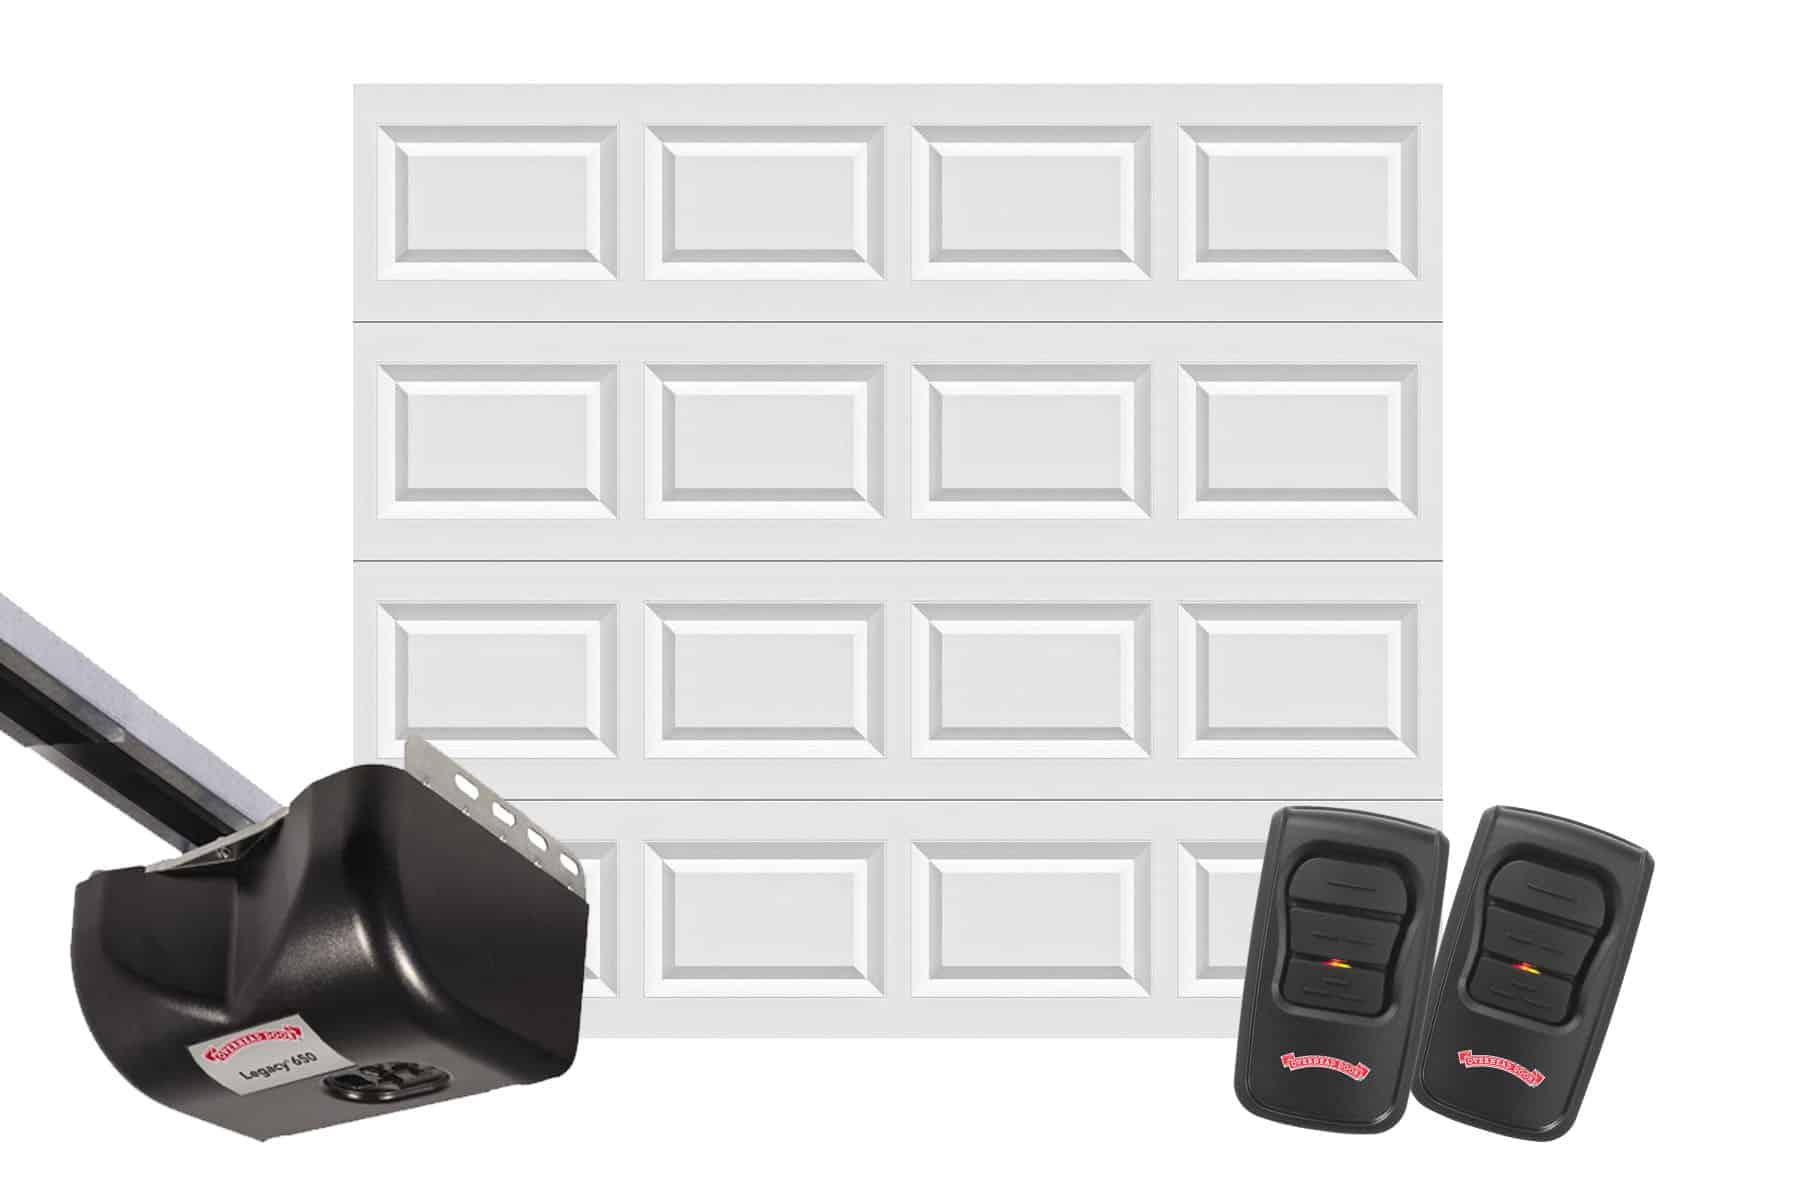 Garage Door Repair Estimates, Pricing Guide, Overhead Door Company of Battle Creek Jackson & Ann Arbor